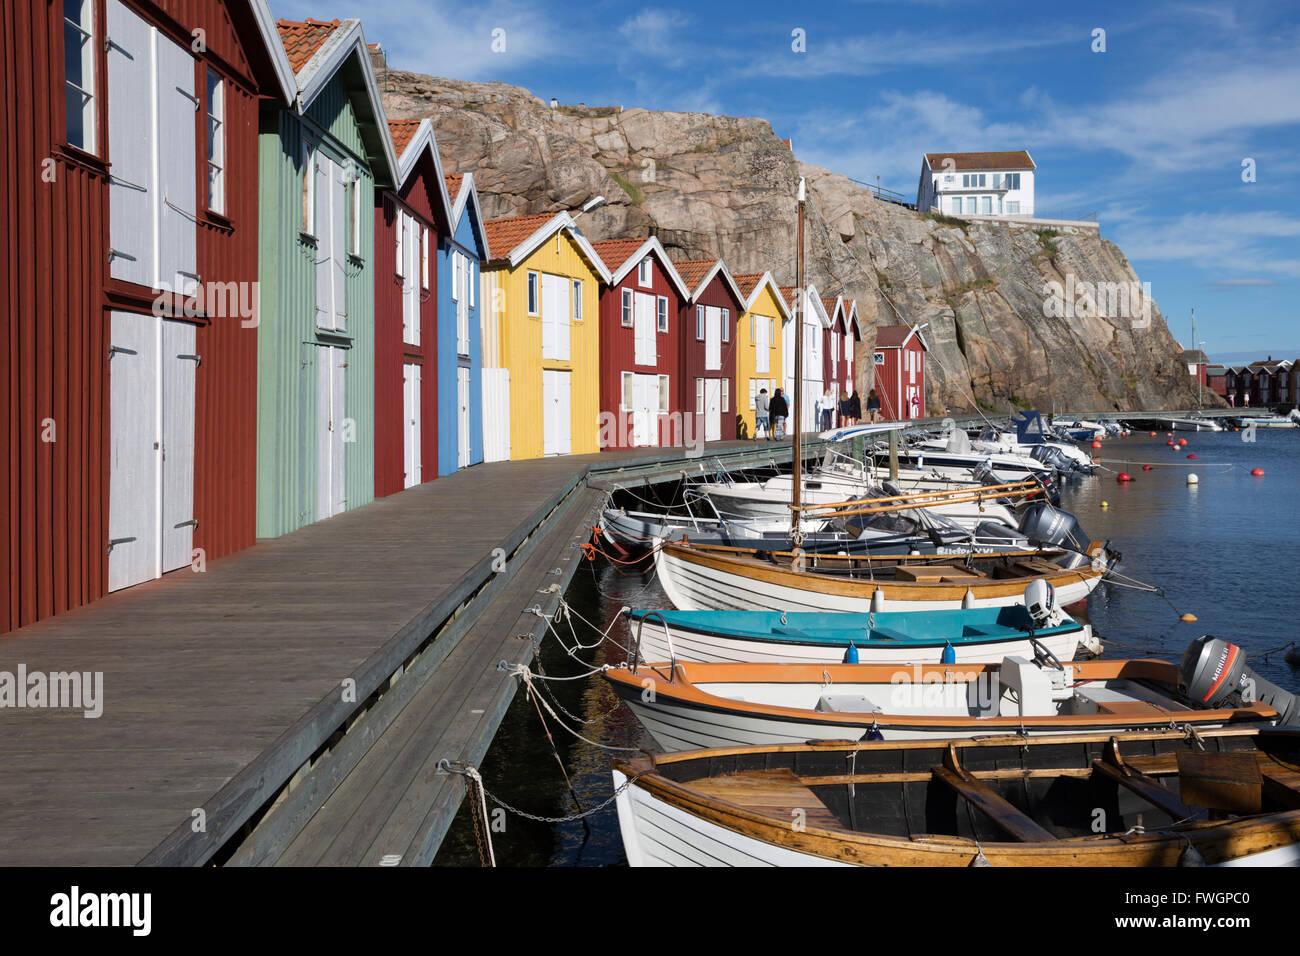 Traditional falu red fishermen's houses in harbour, Smogen, Bohuslan Coast, Southwest Sweden, Sweden, Scandinavia, - Stock Image